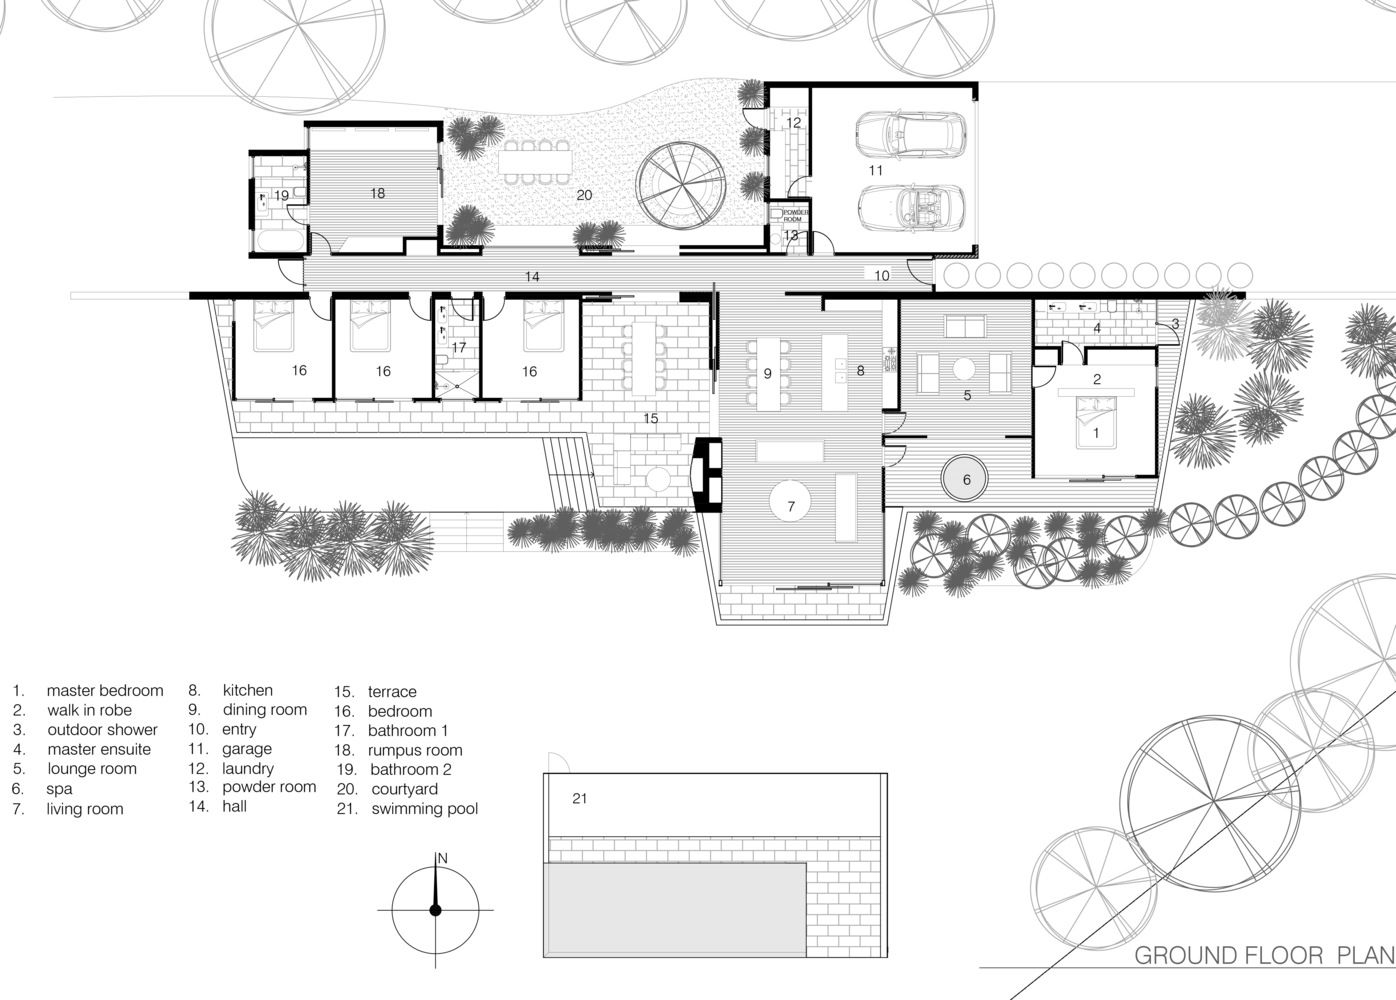 Cedar Lane House Ground Floor Plan Floor Plans House Plans One Story Ground Floor Plan